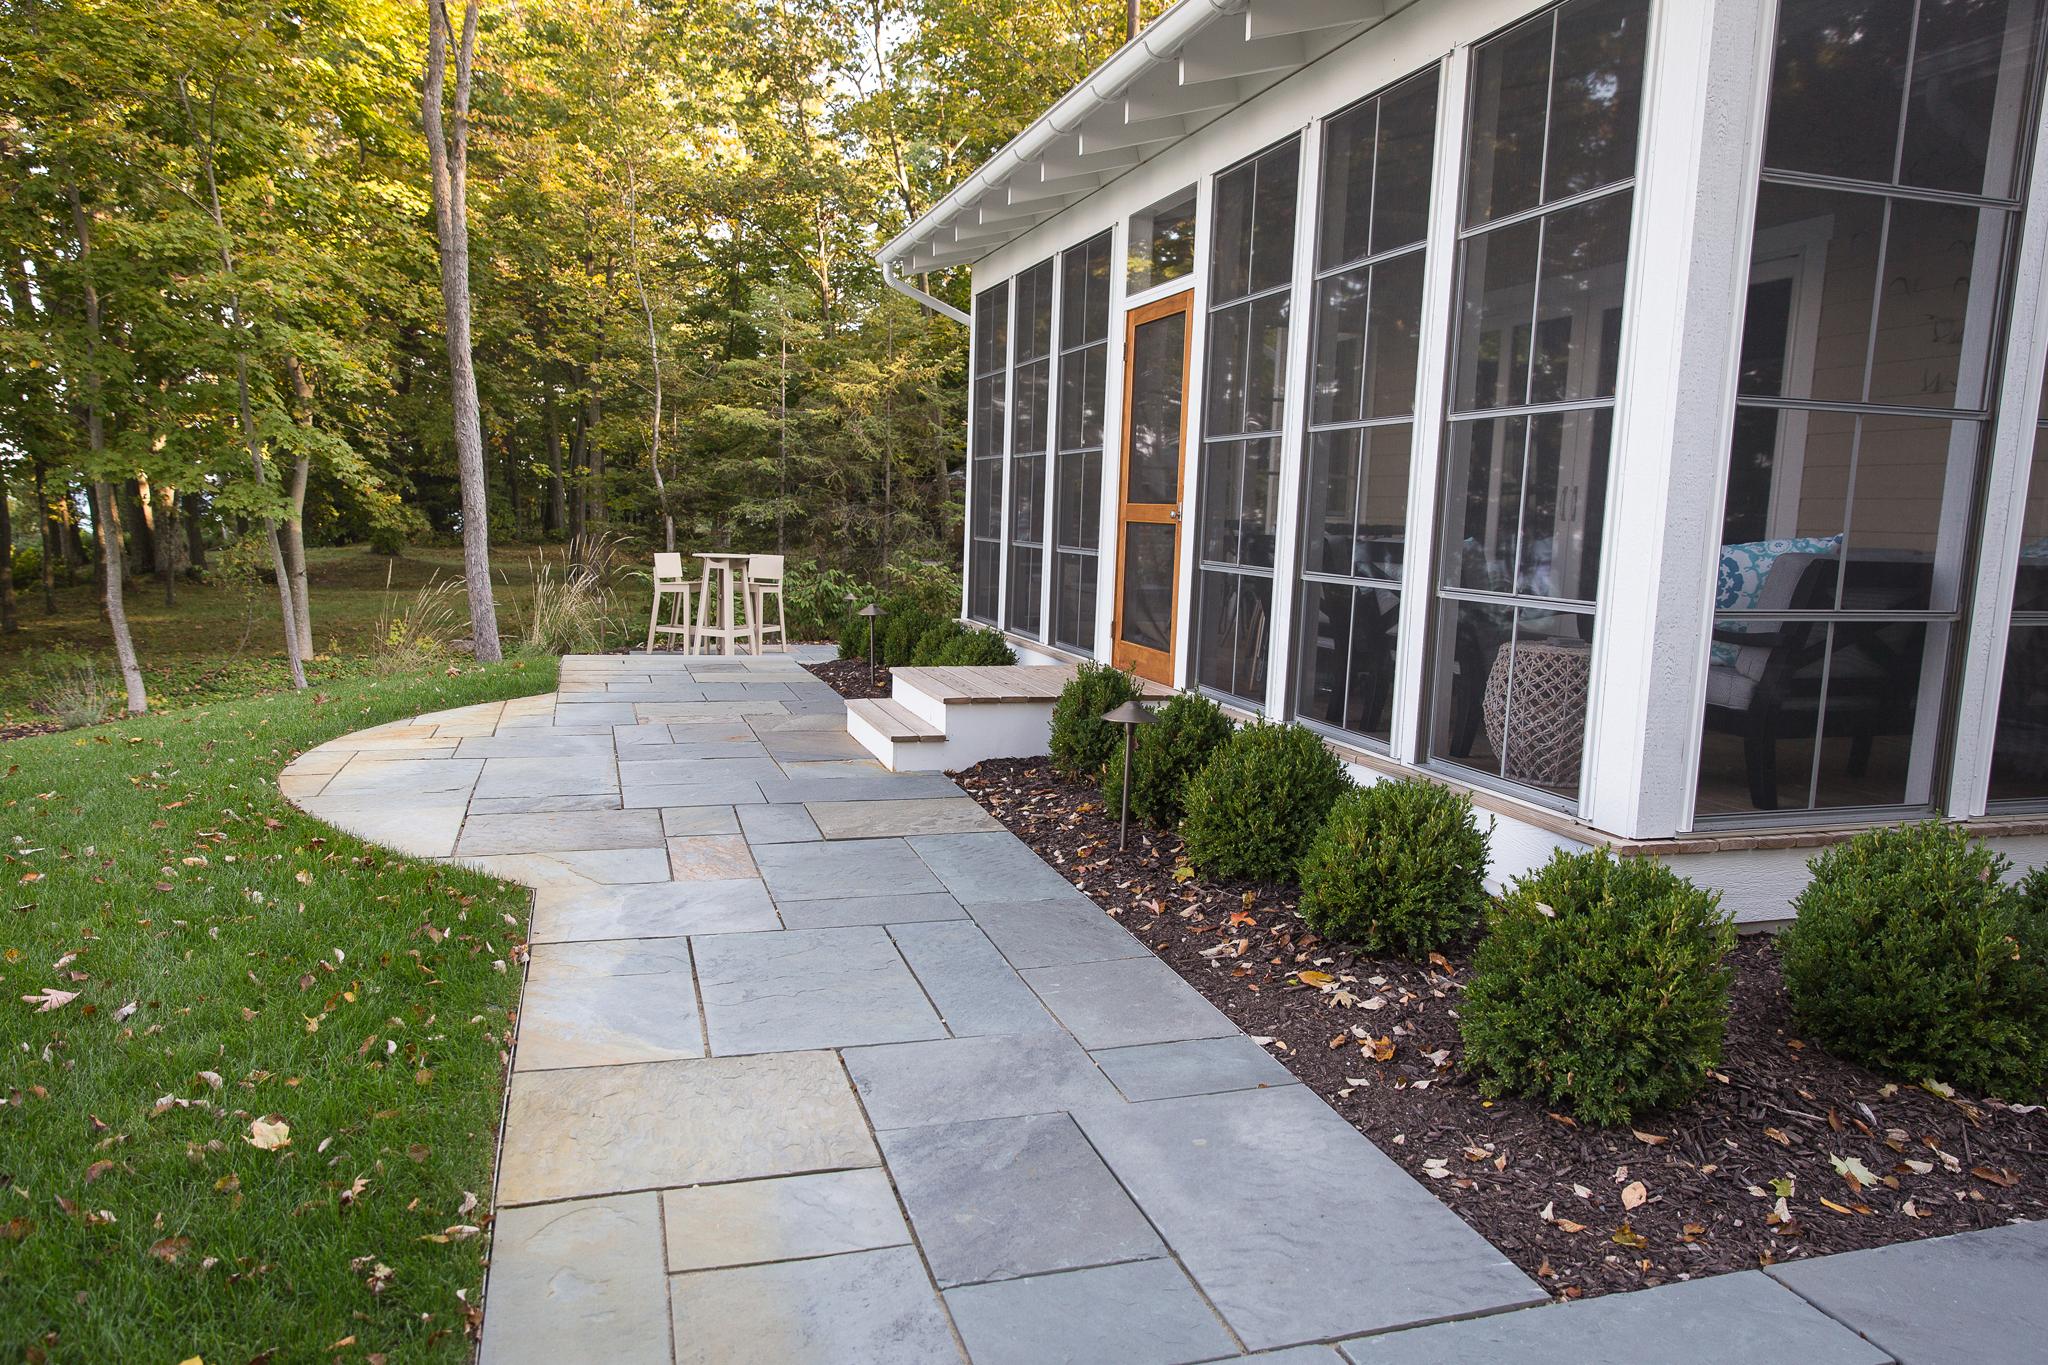 backyard patios u0026 walkway ideas essex outdoor design